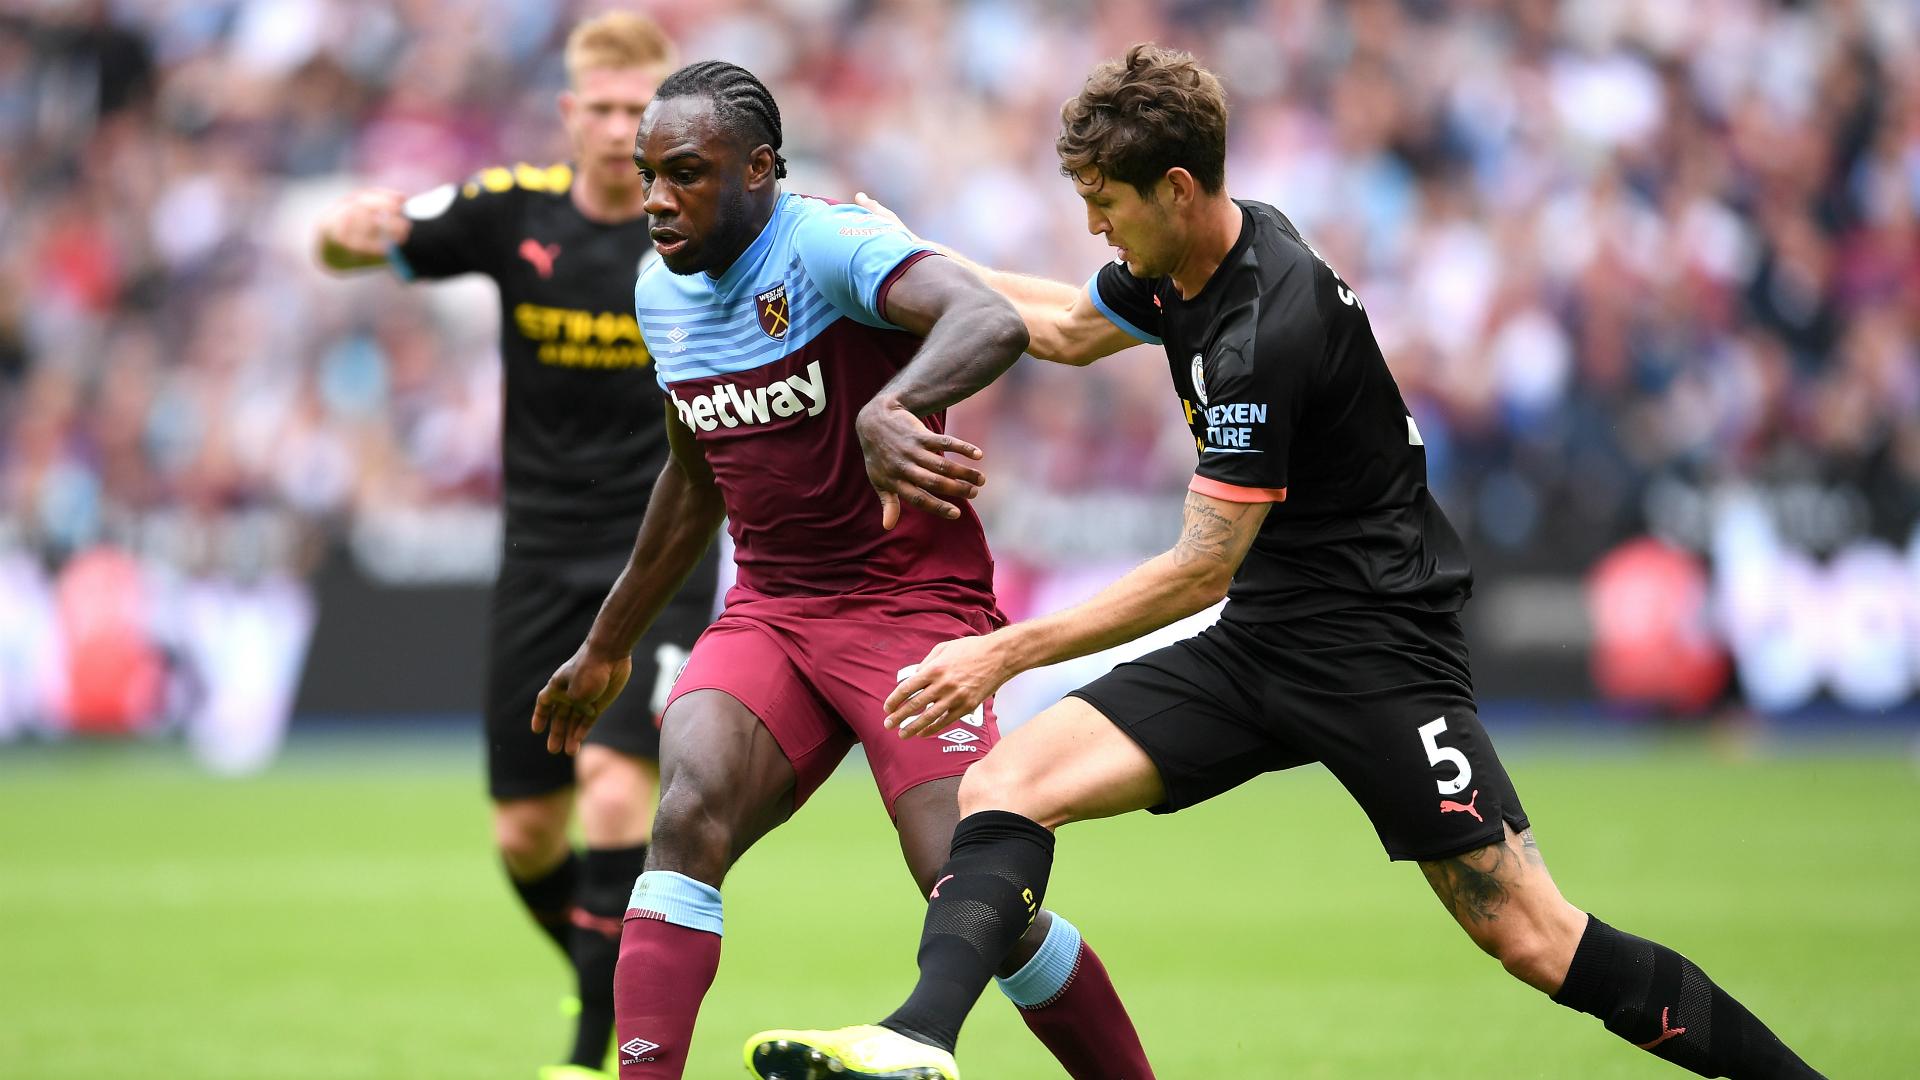 Manchester City Defeat Won't Define Our Season, Says West Ham Star